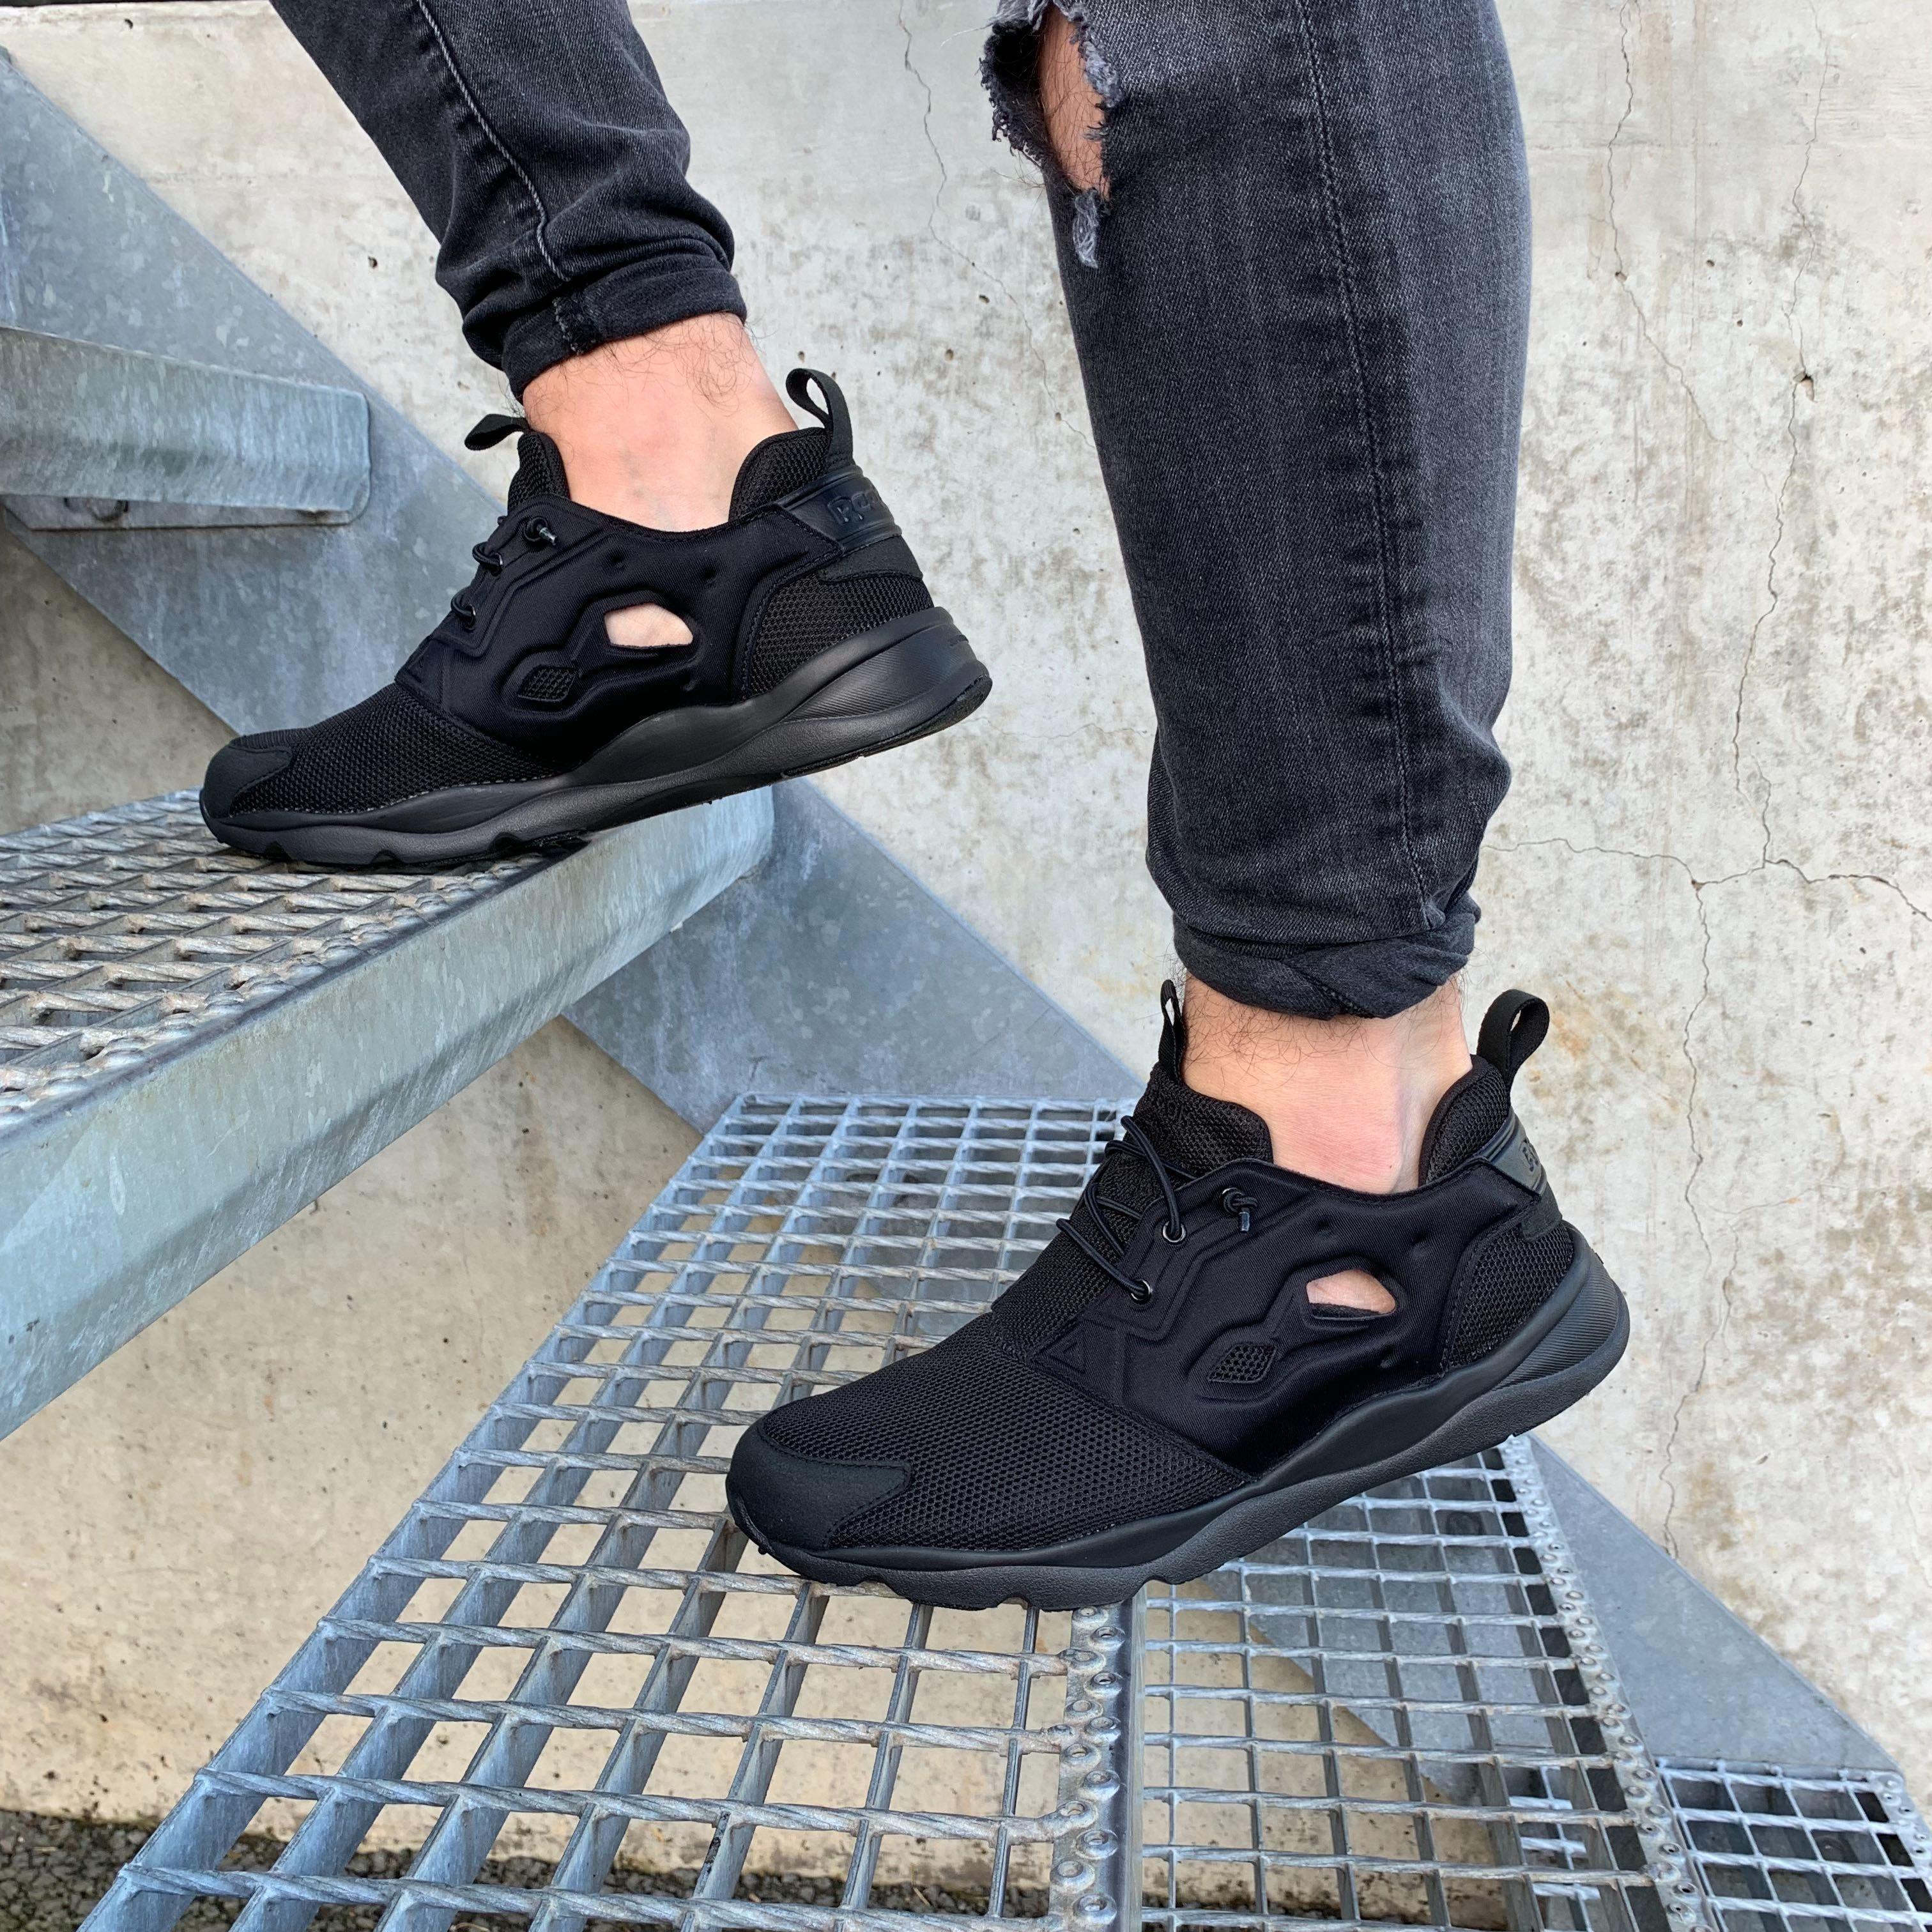 NEU Reebok Furylite Triple Black Trainer Sneaker V67159